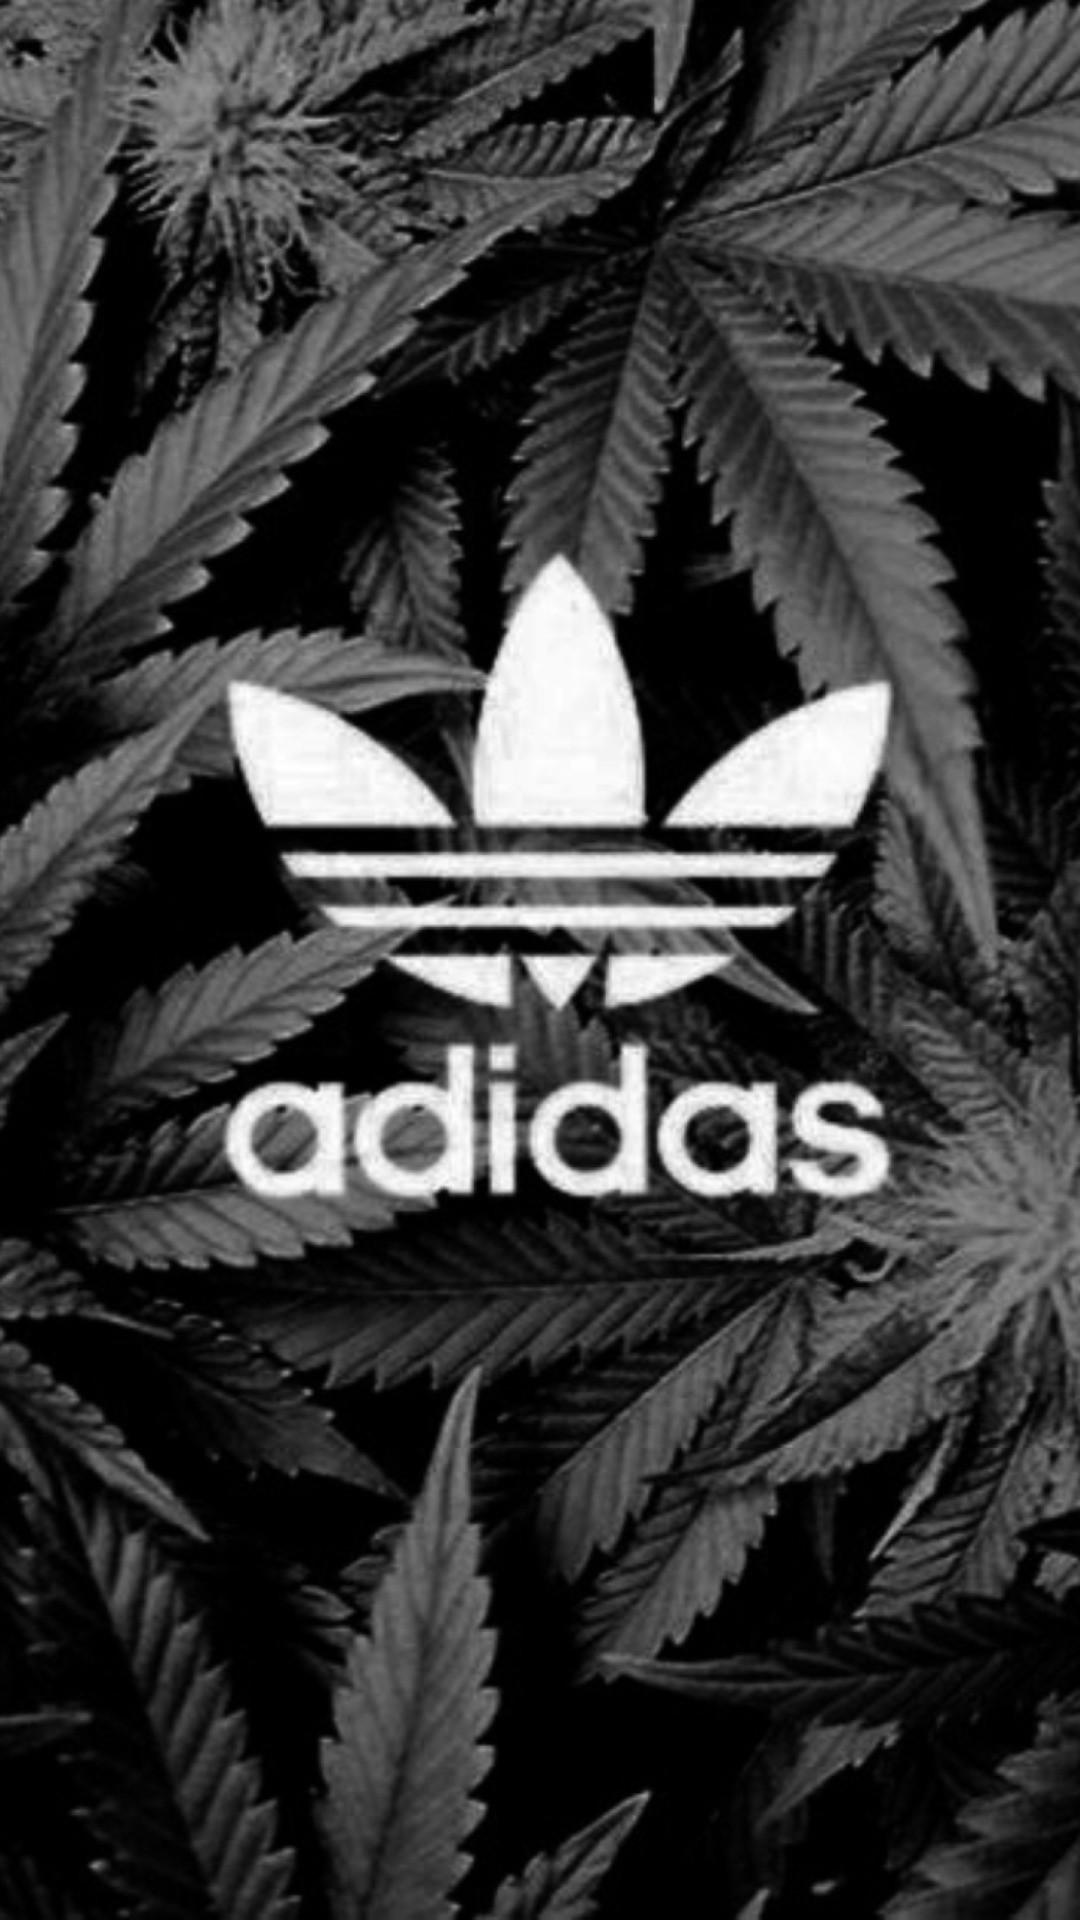 Htc One M8 Wallpaper Hd Die 74 Besten Adidas Wallpapers